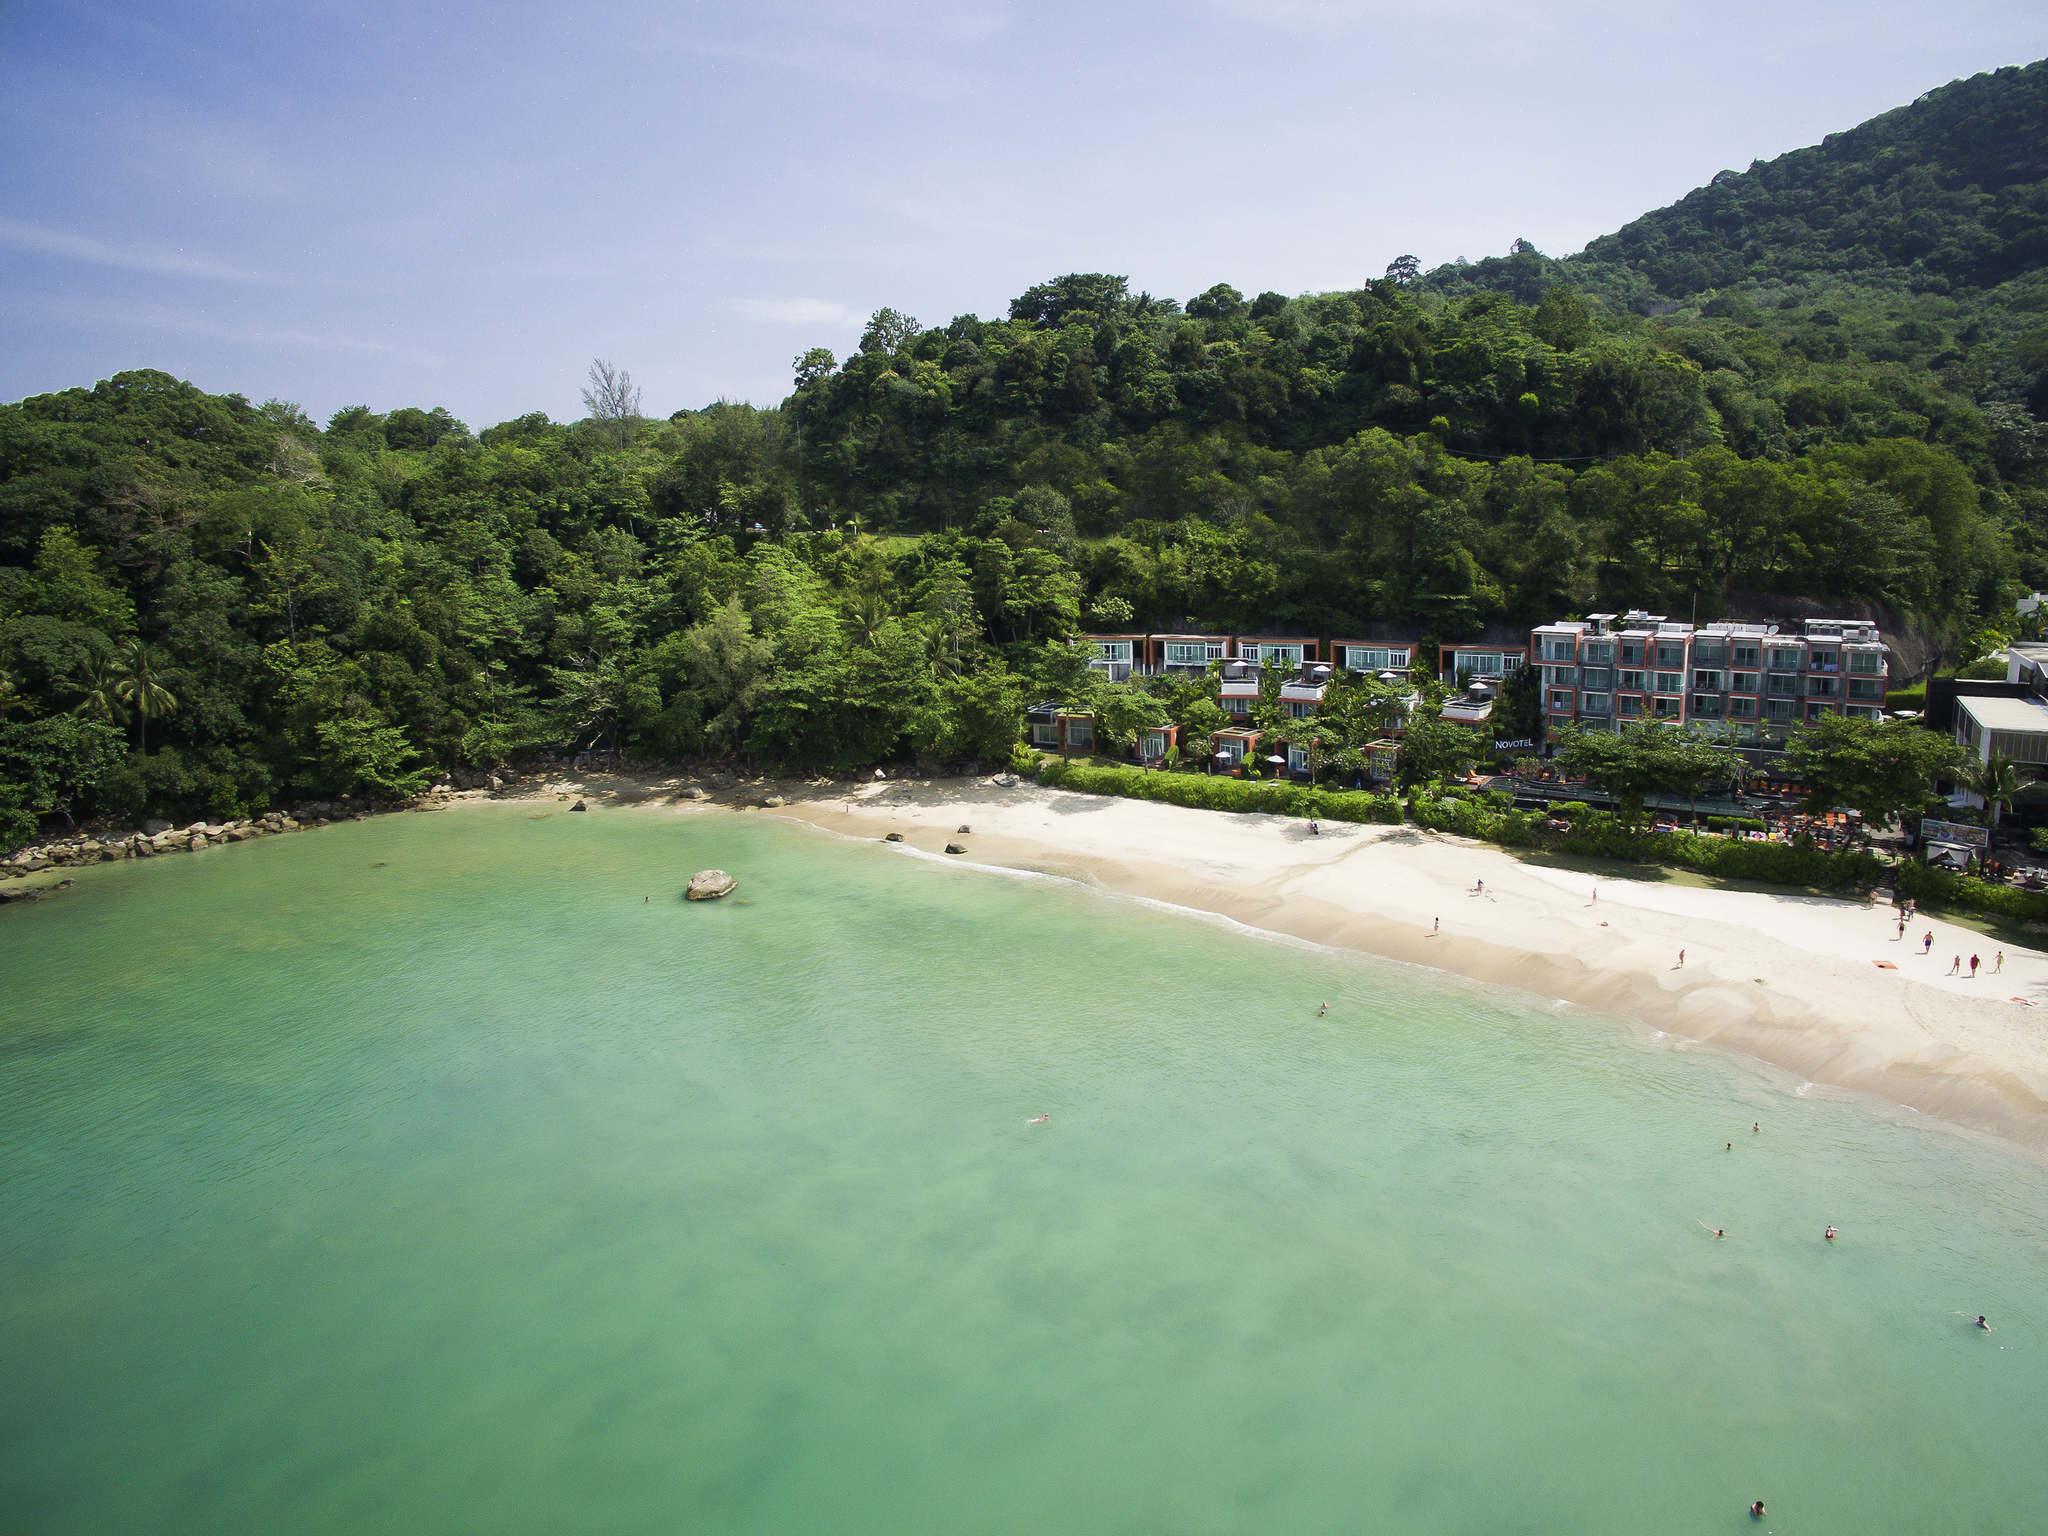 phuket beach hotel case solution Phuket beach hotel - free download as  phuket beach - team 1 cargado por  mohan kumar sampa video solution - harvard case solution cargado por kanabaramit.